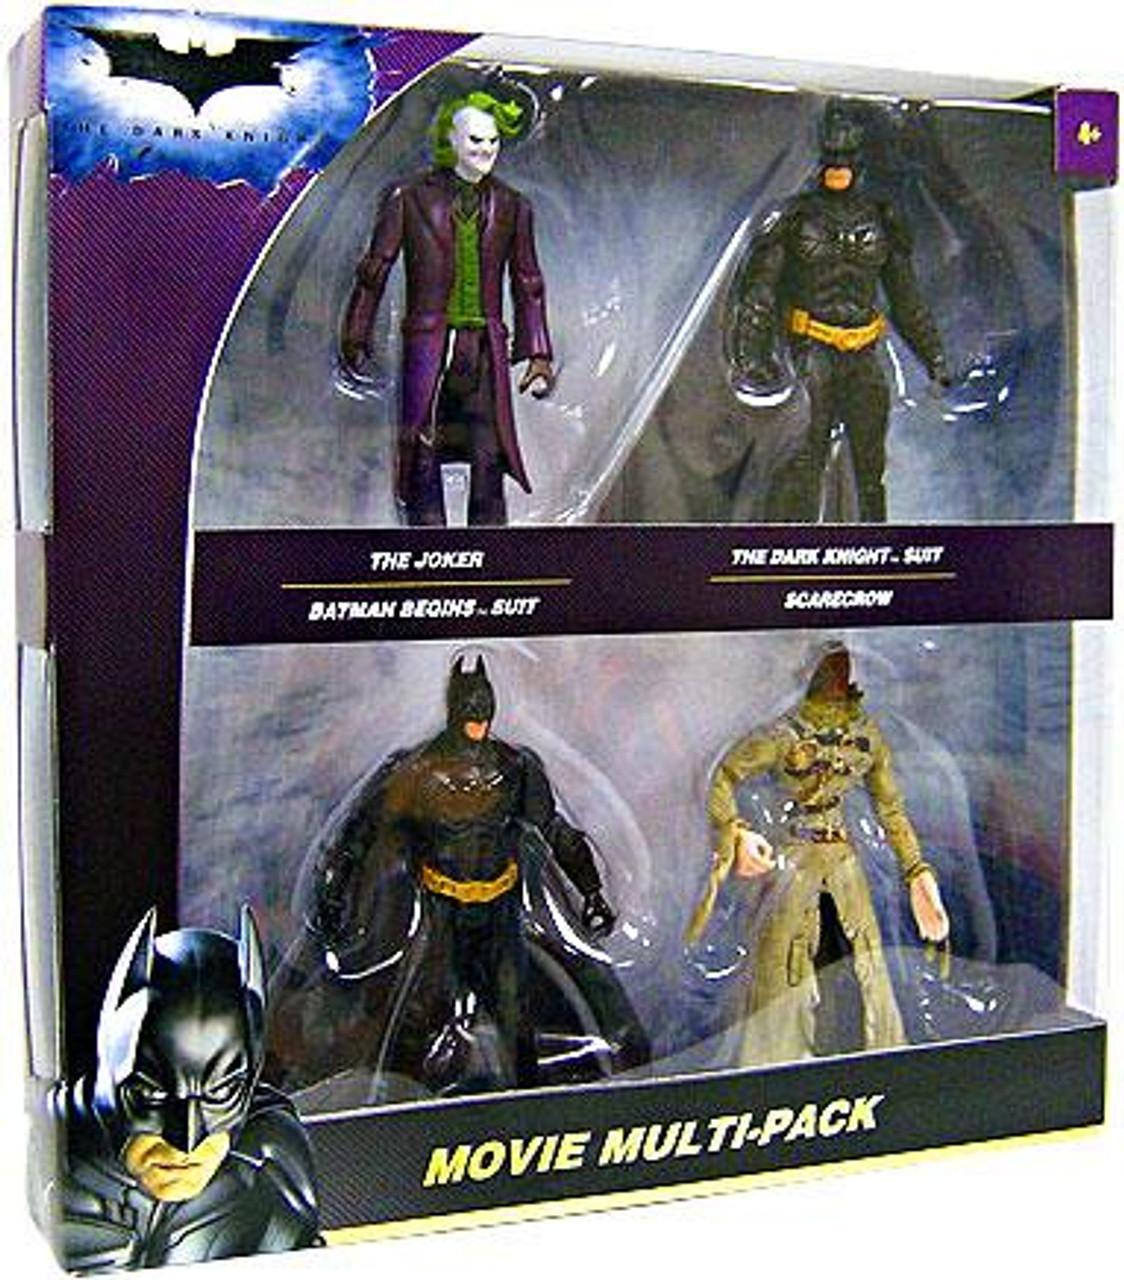 The Dark Knight Joker, Batman, Dark Knight & Scarecrow Action Figure 4-Pack [Movie Multipack]